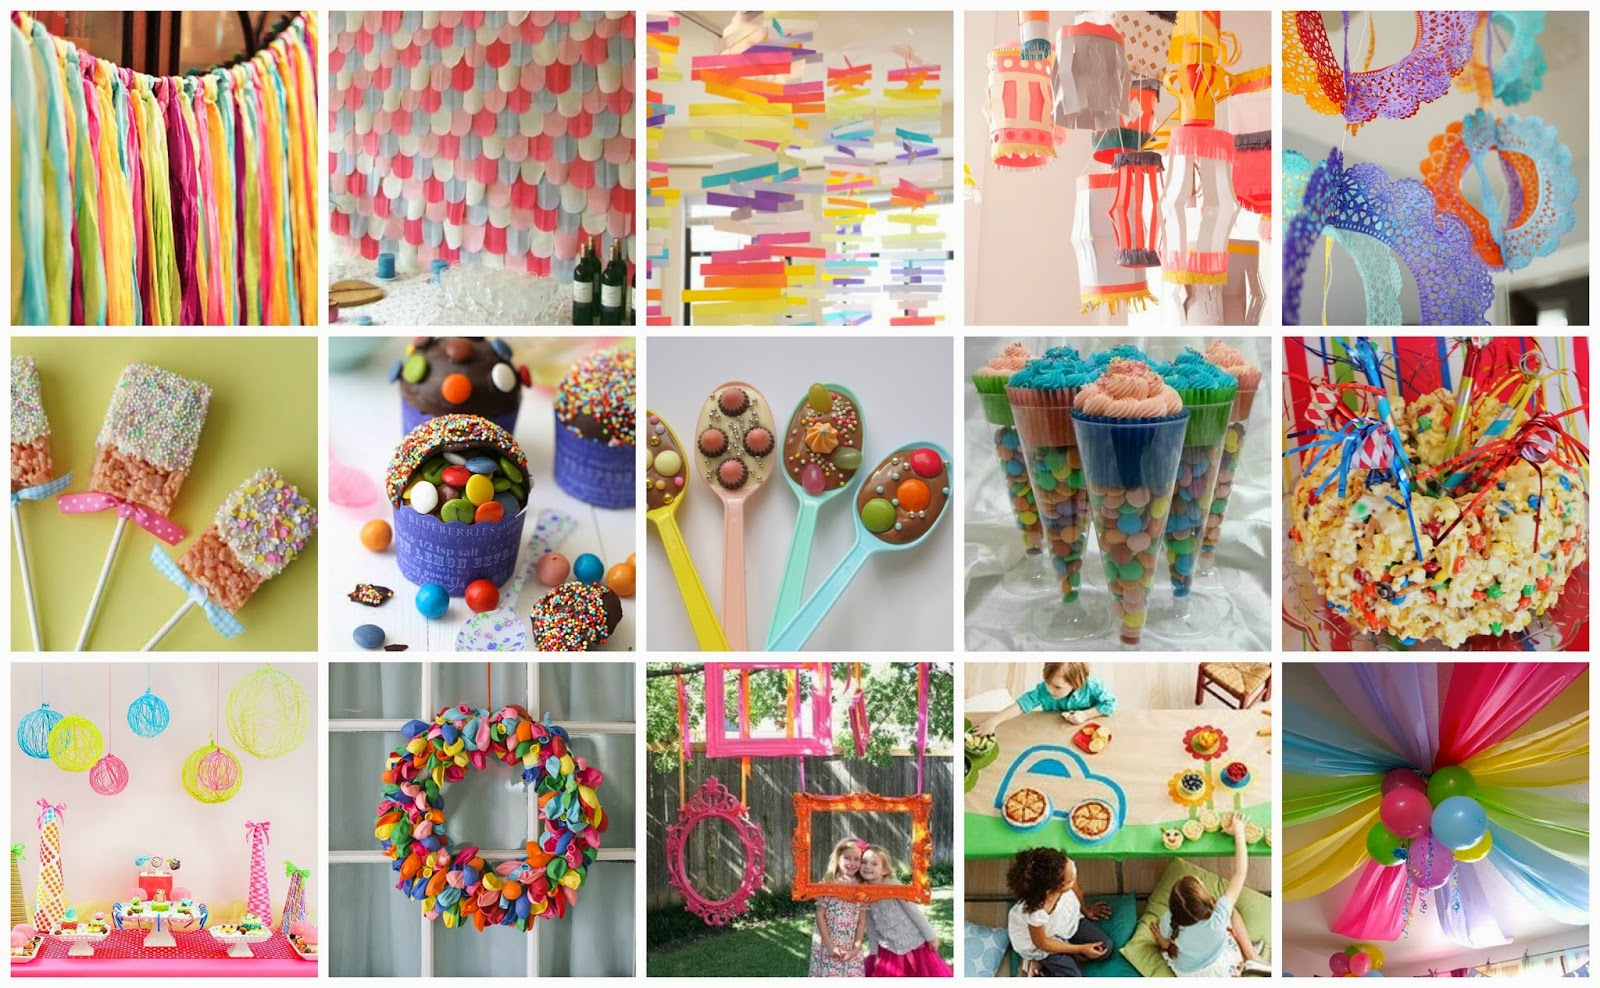 Ideas De Decoracion Para Fiestas Infantiles ~ Enviar por correo electr?nico Escribe un blog Compartir con Twitter